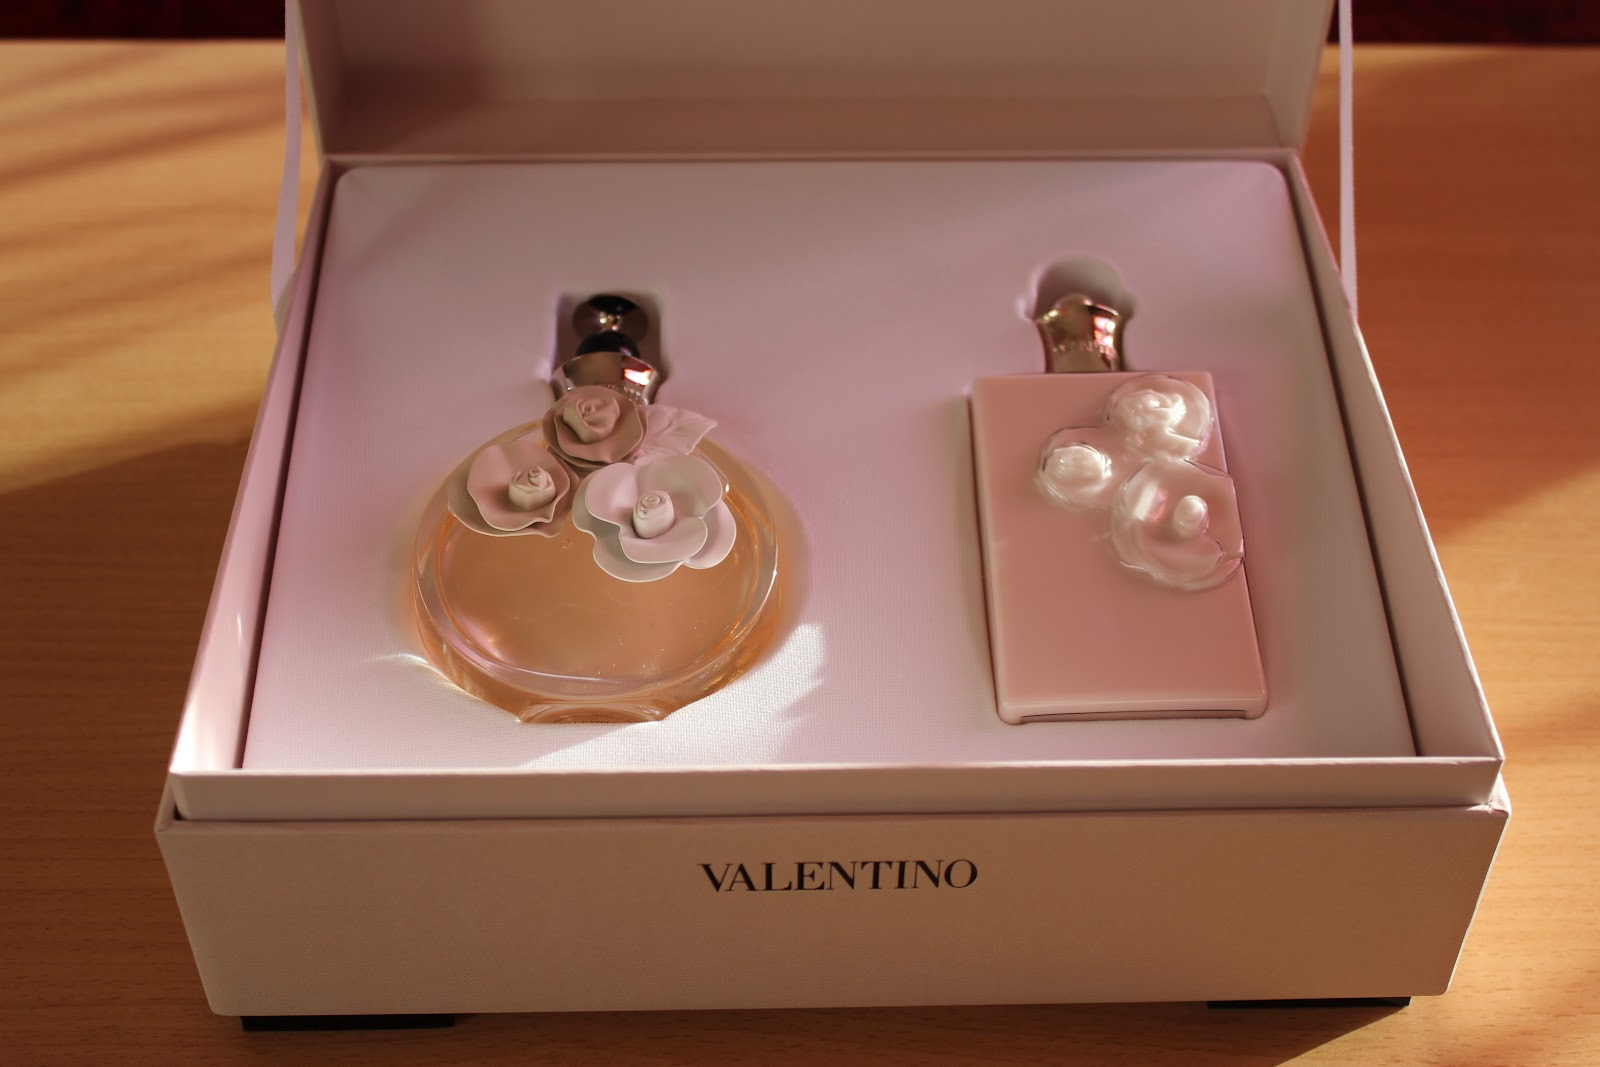 Valentino Parfum Parfum Parfum Coffret Coffret Coffret Parfum Valentino Coffret Parfum Valentino Coffret Valentino Valentino O8n0wPkX